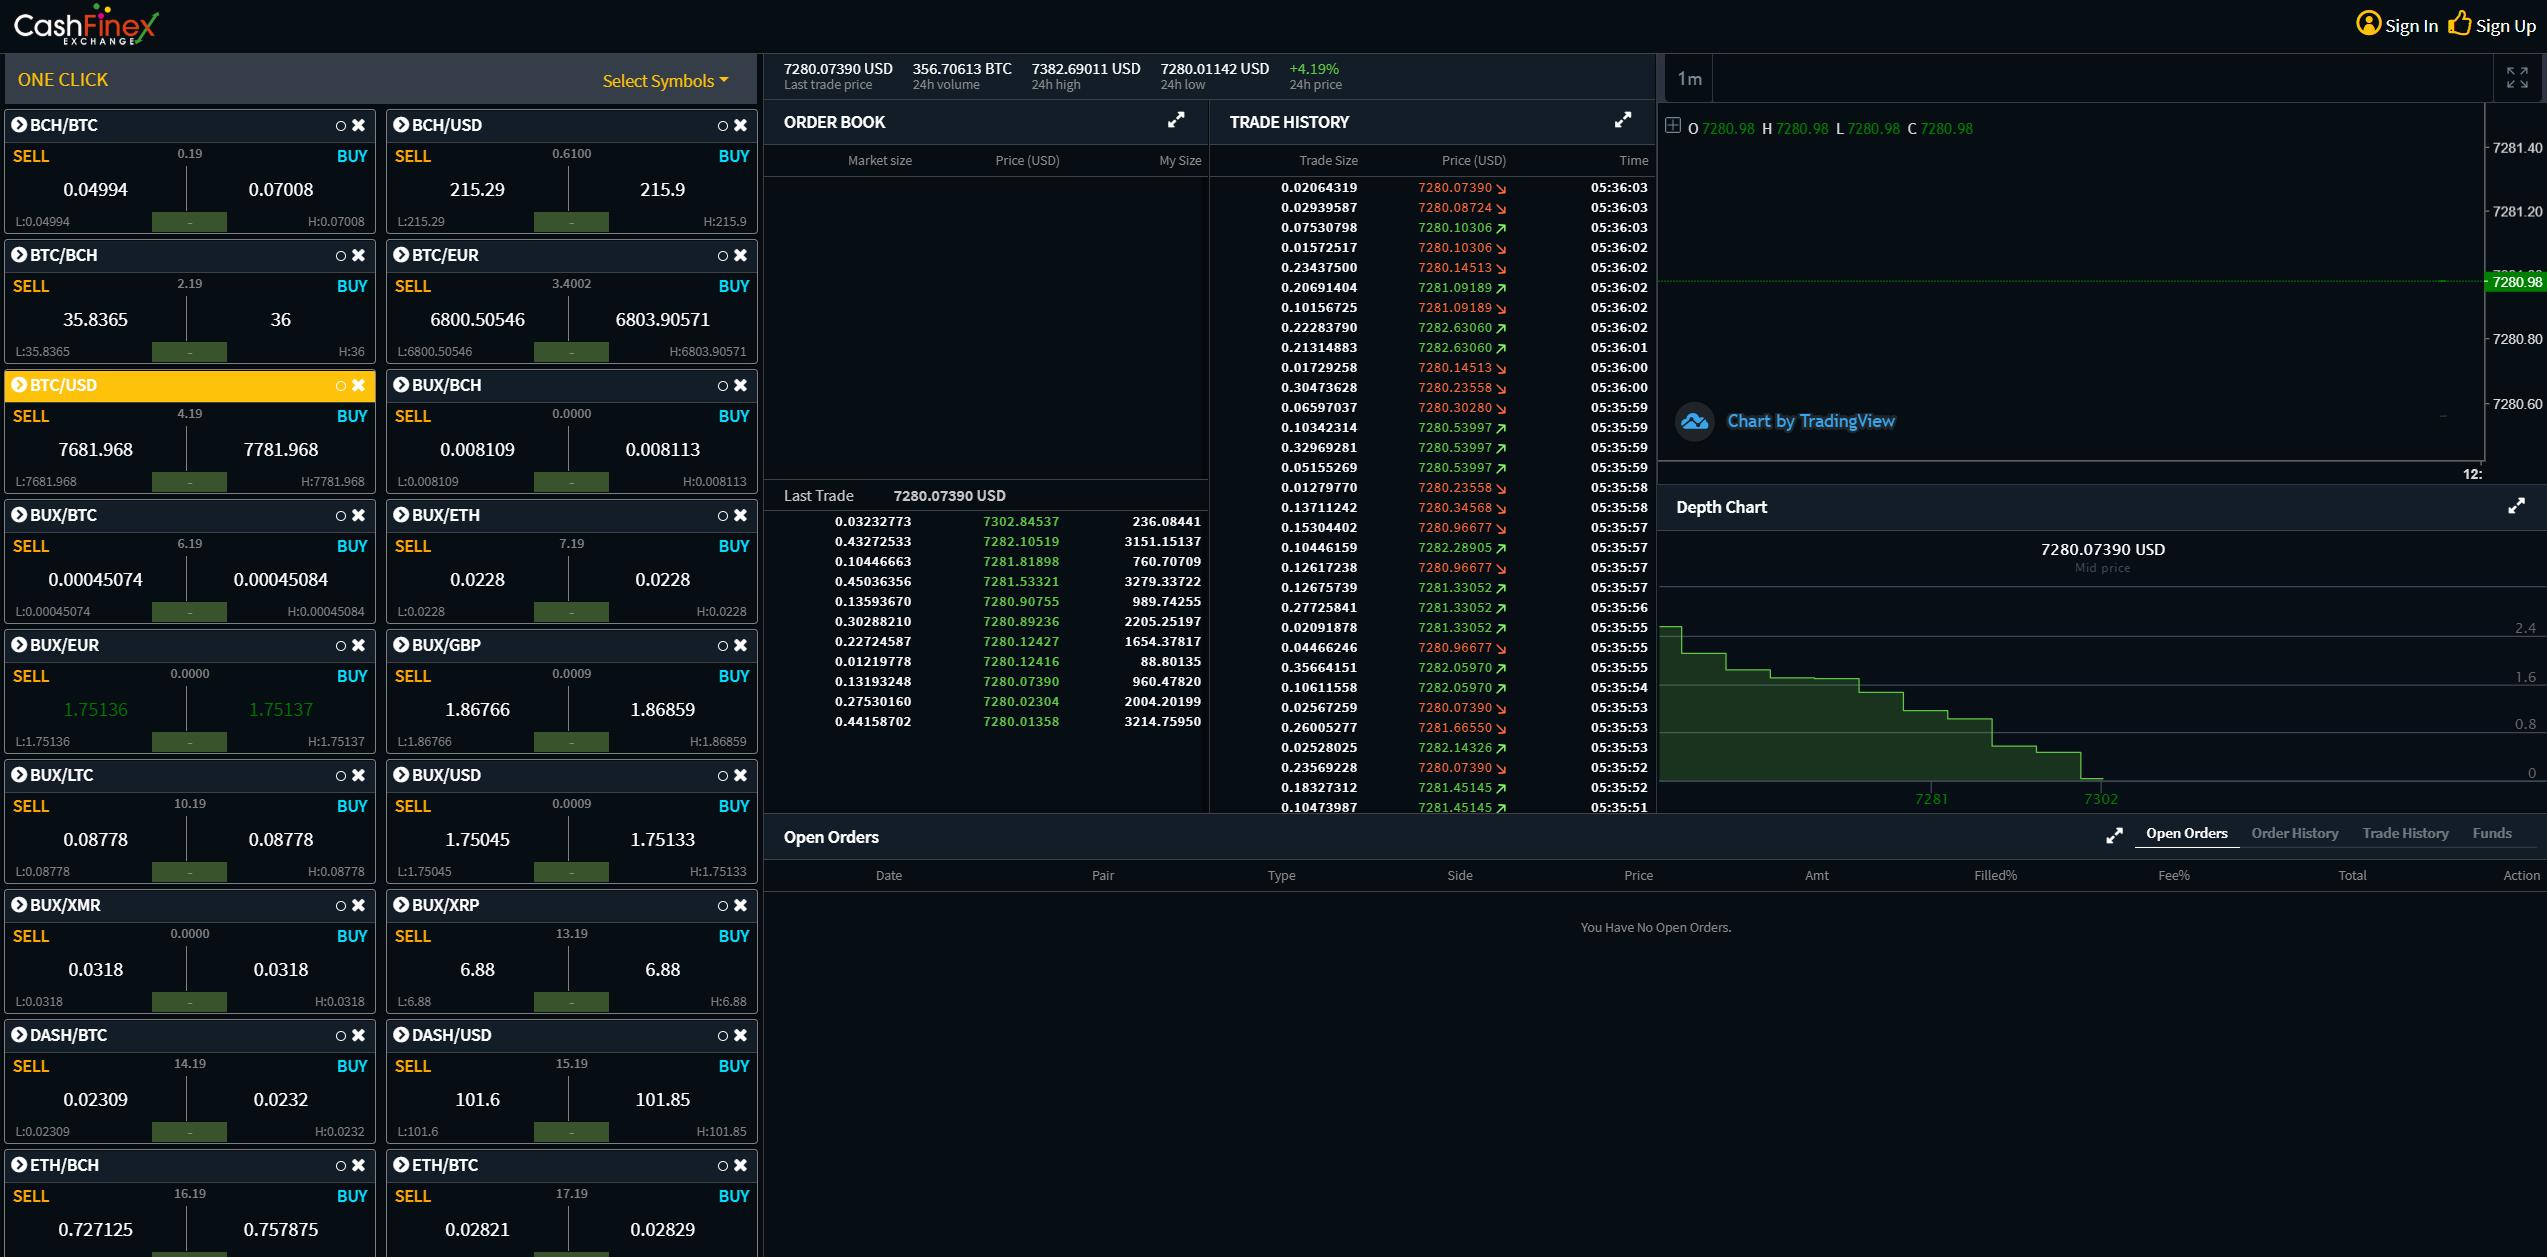 CashFinex Trading View